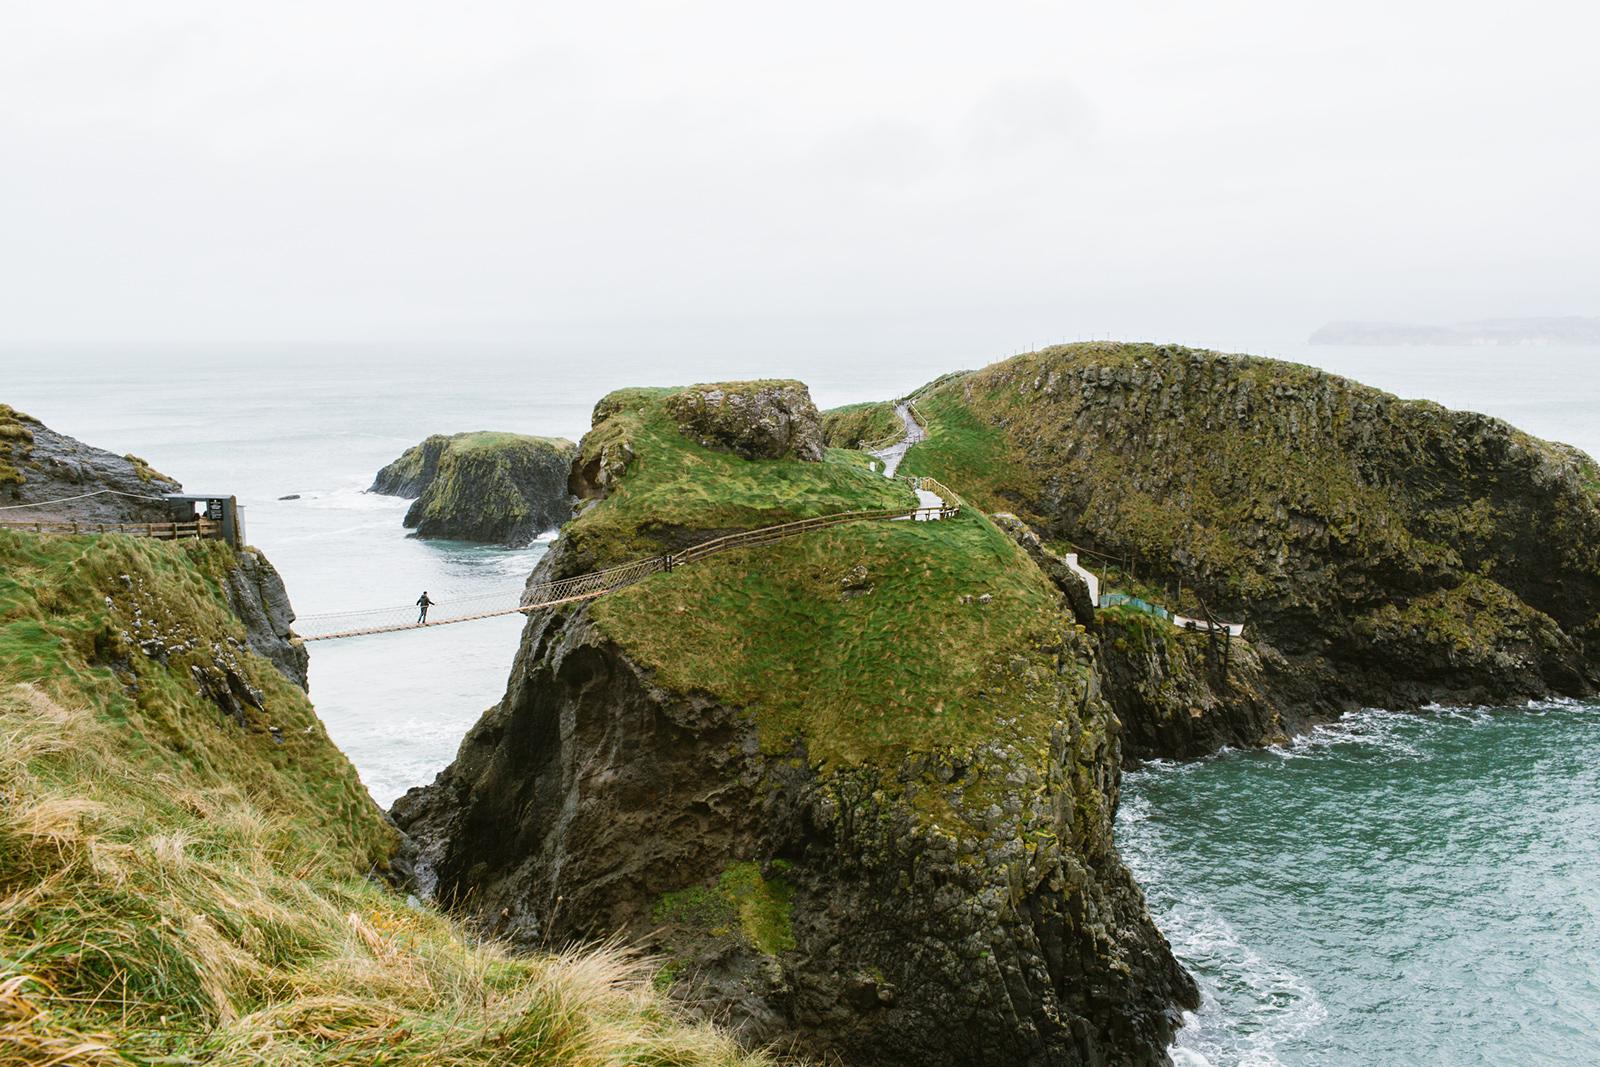 Northern_Ireland-201301-FinnBeales-1600-008.jpg